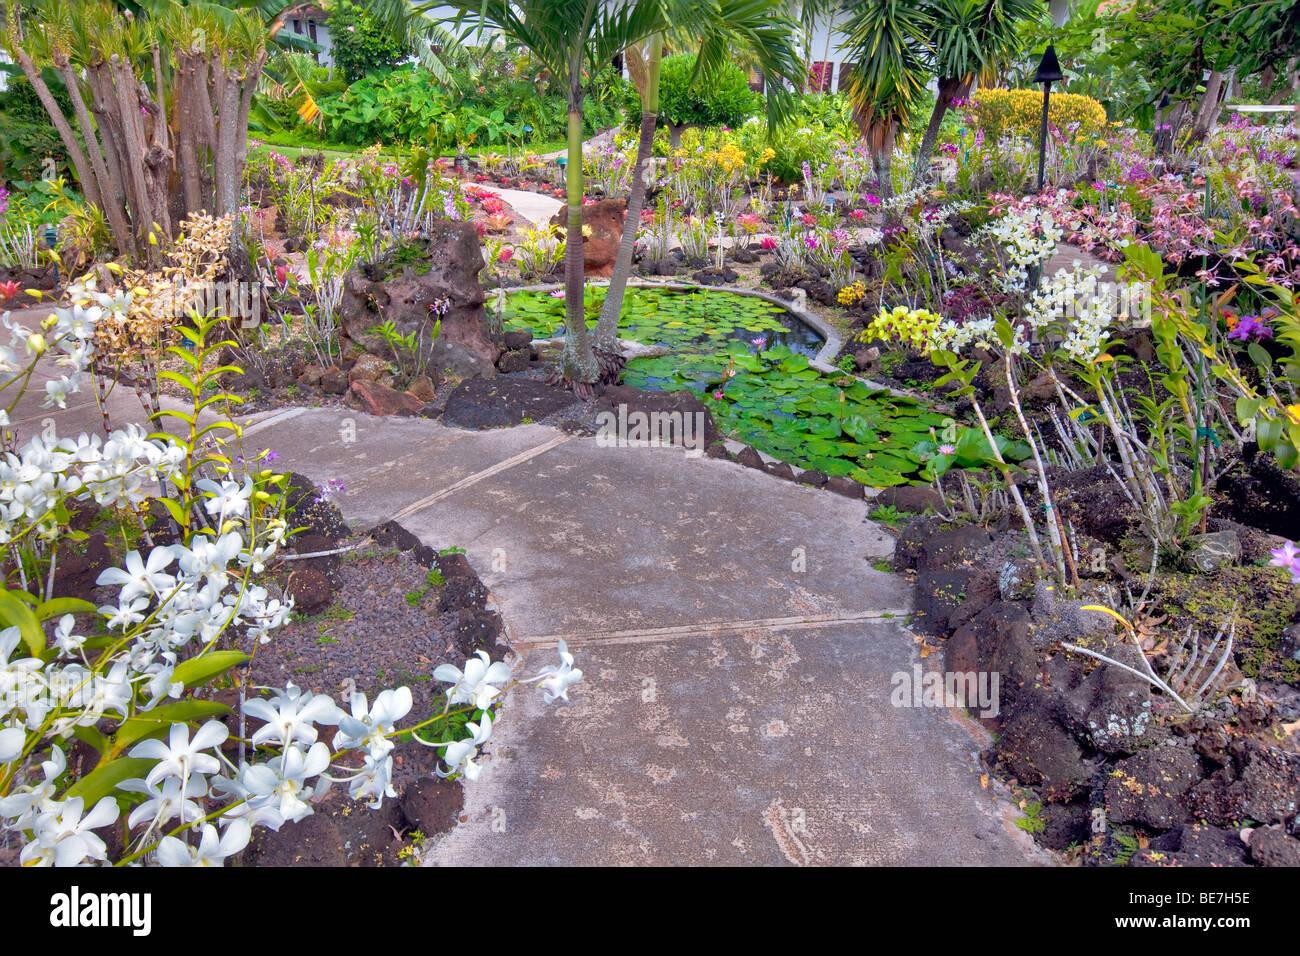 Orchideen und Pfad bei Moir Gardens. Klahuna Plantation Resort. Kauai, Hawaii Stockbild